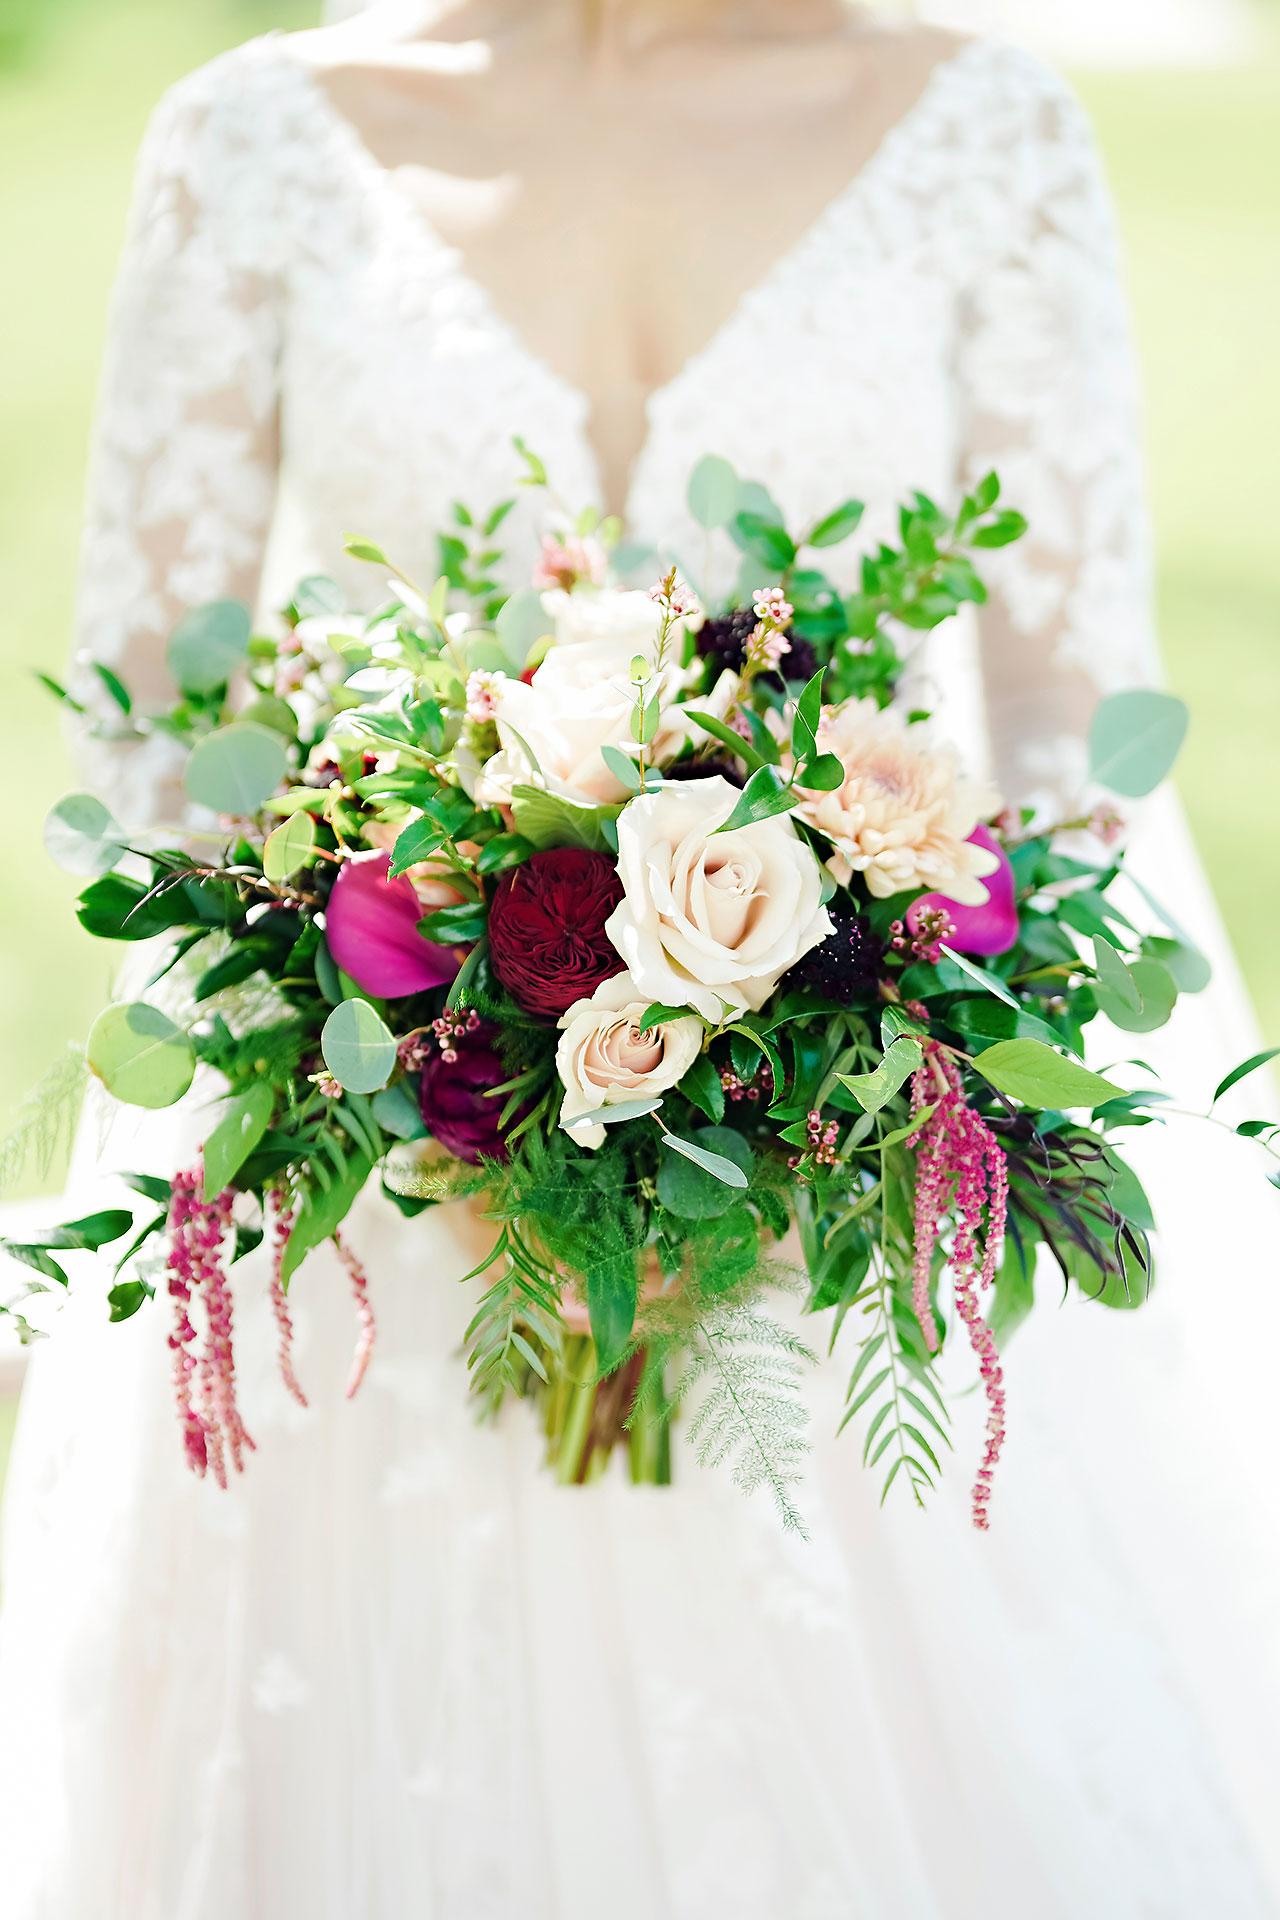 Nadia Parker Black Iris Estate Carmel Indiana Wedding May 2021 078